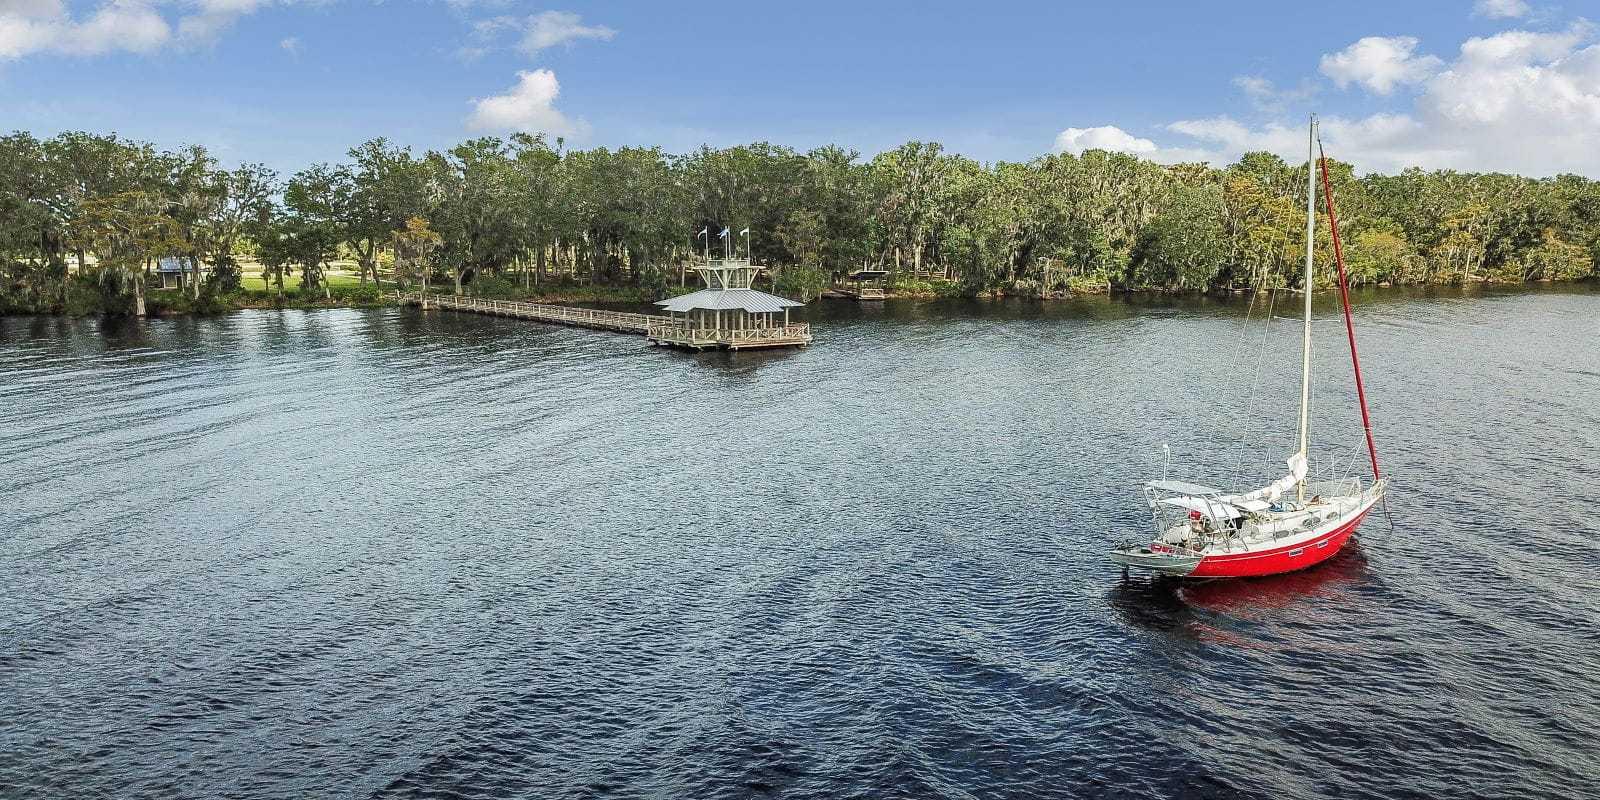 RiverTown - WestLake:St. Johns, FL